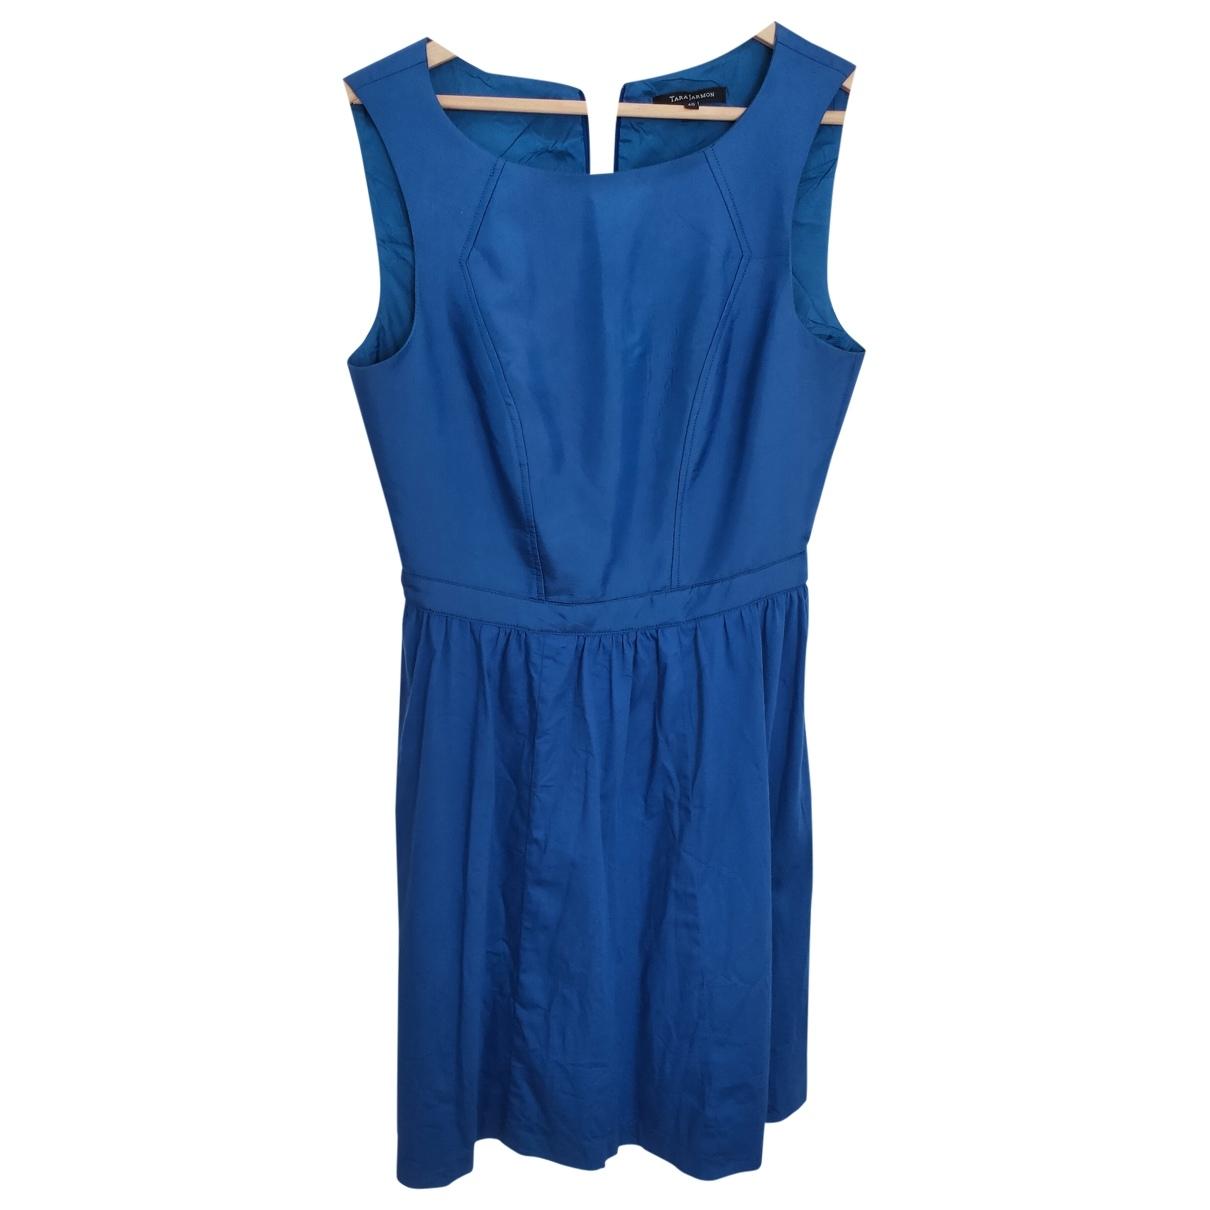 Tara Jarmon \N Blue Cotton dress for Women 40 FR